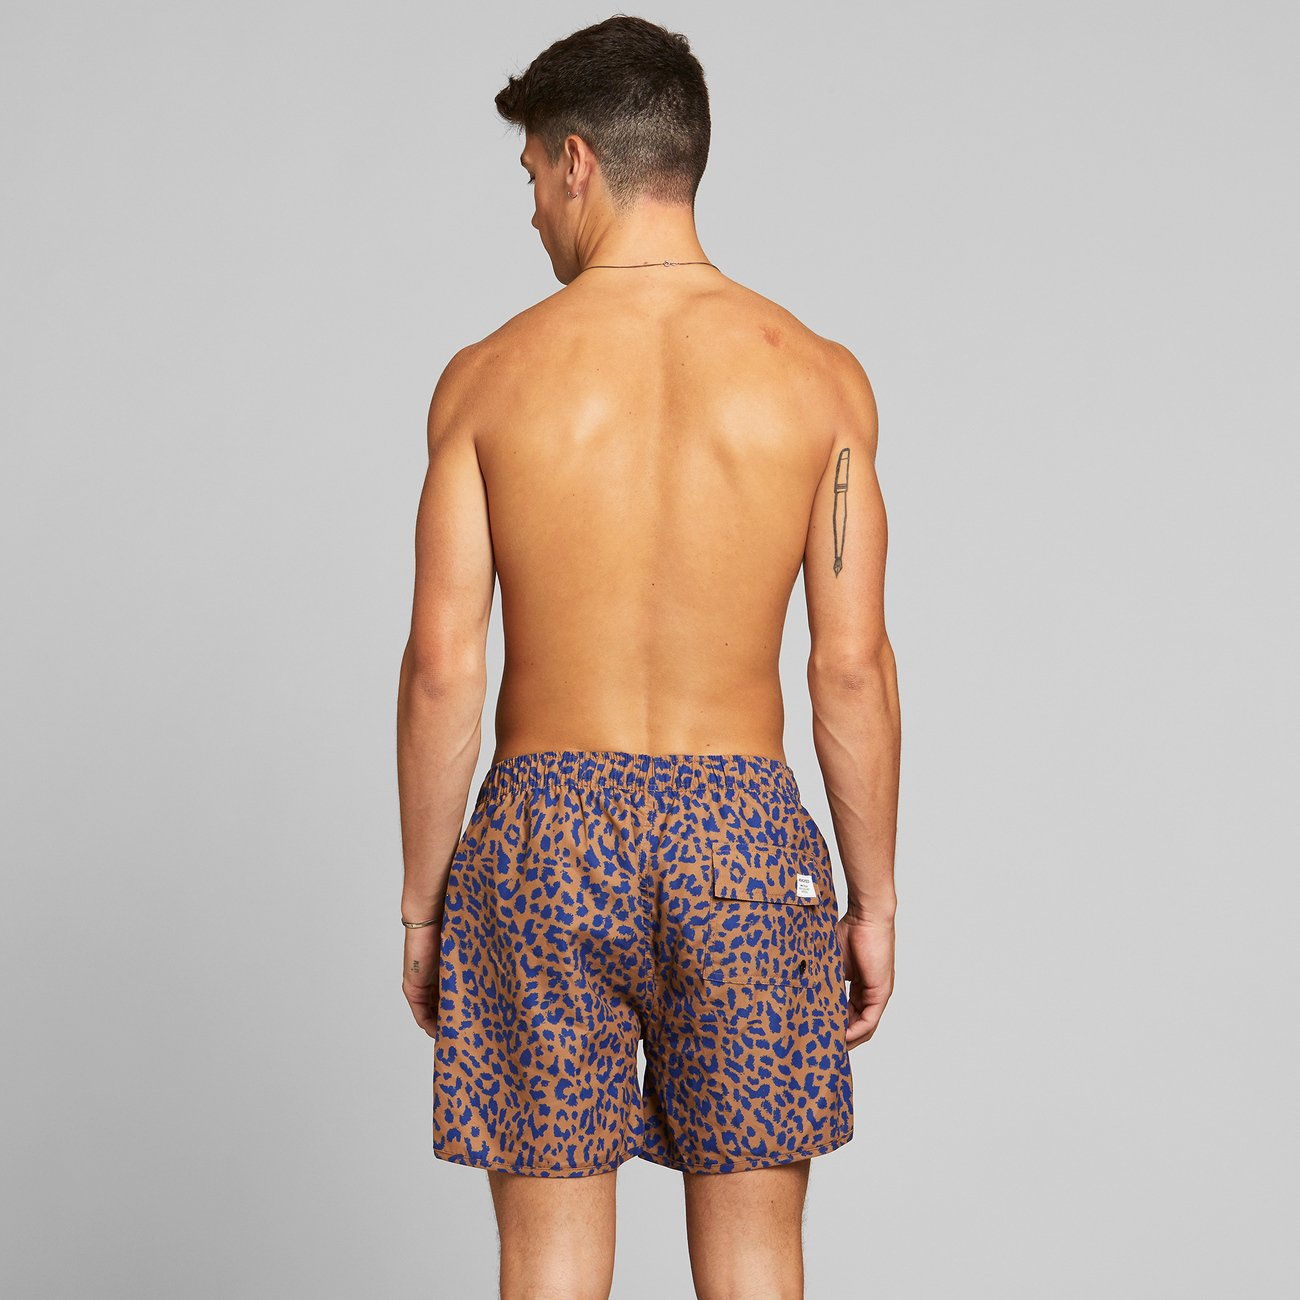 Dedicated - Swim Shorts Sandhamn Leopard Light Brown